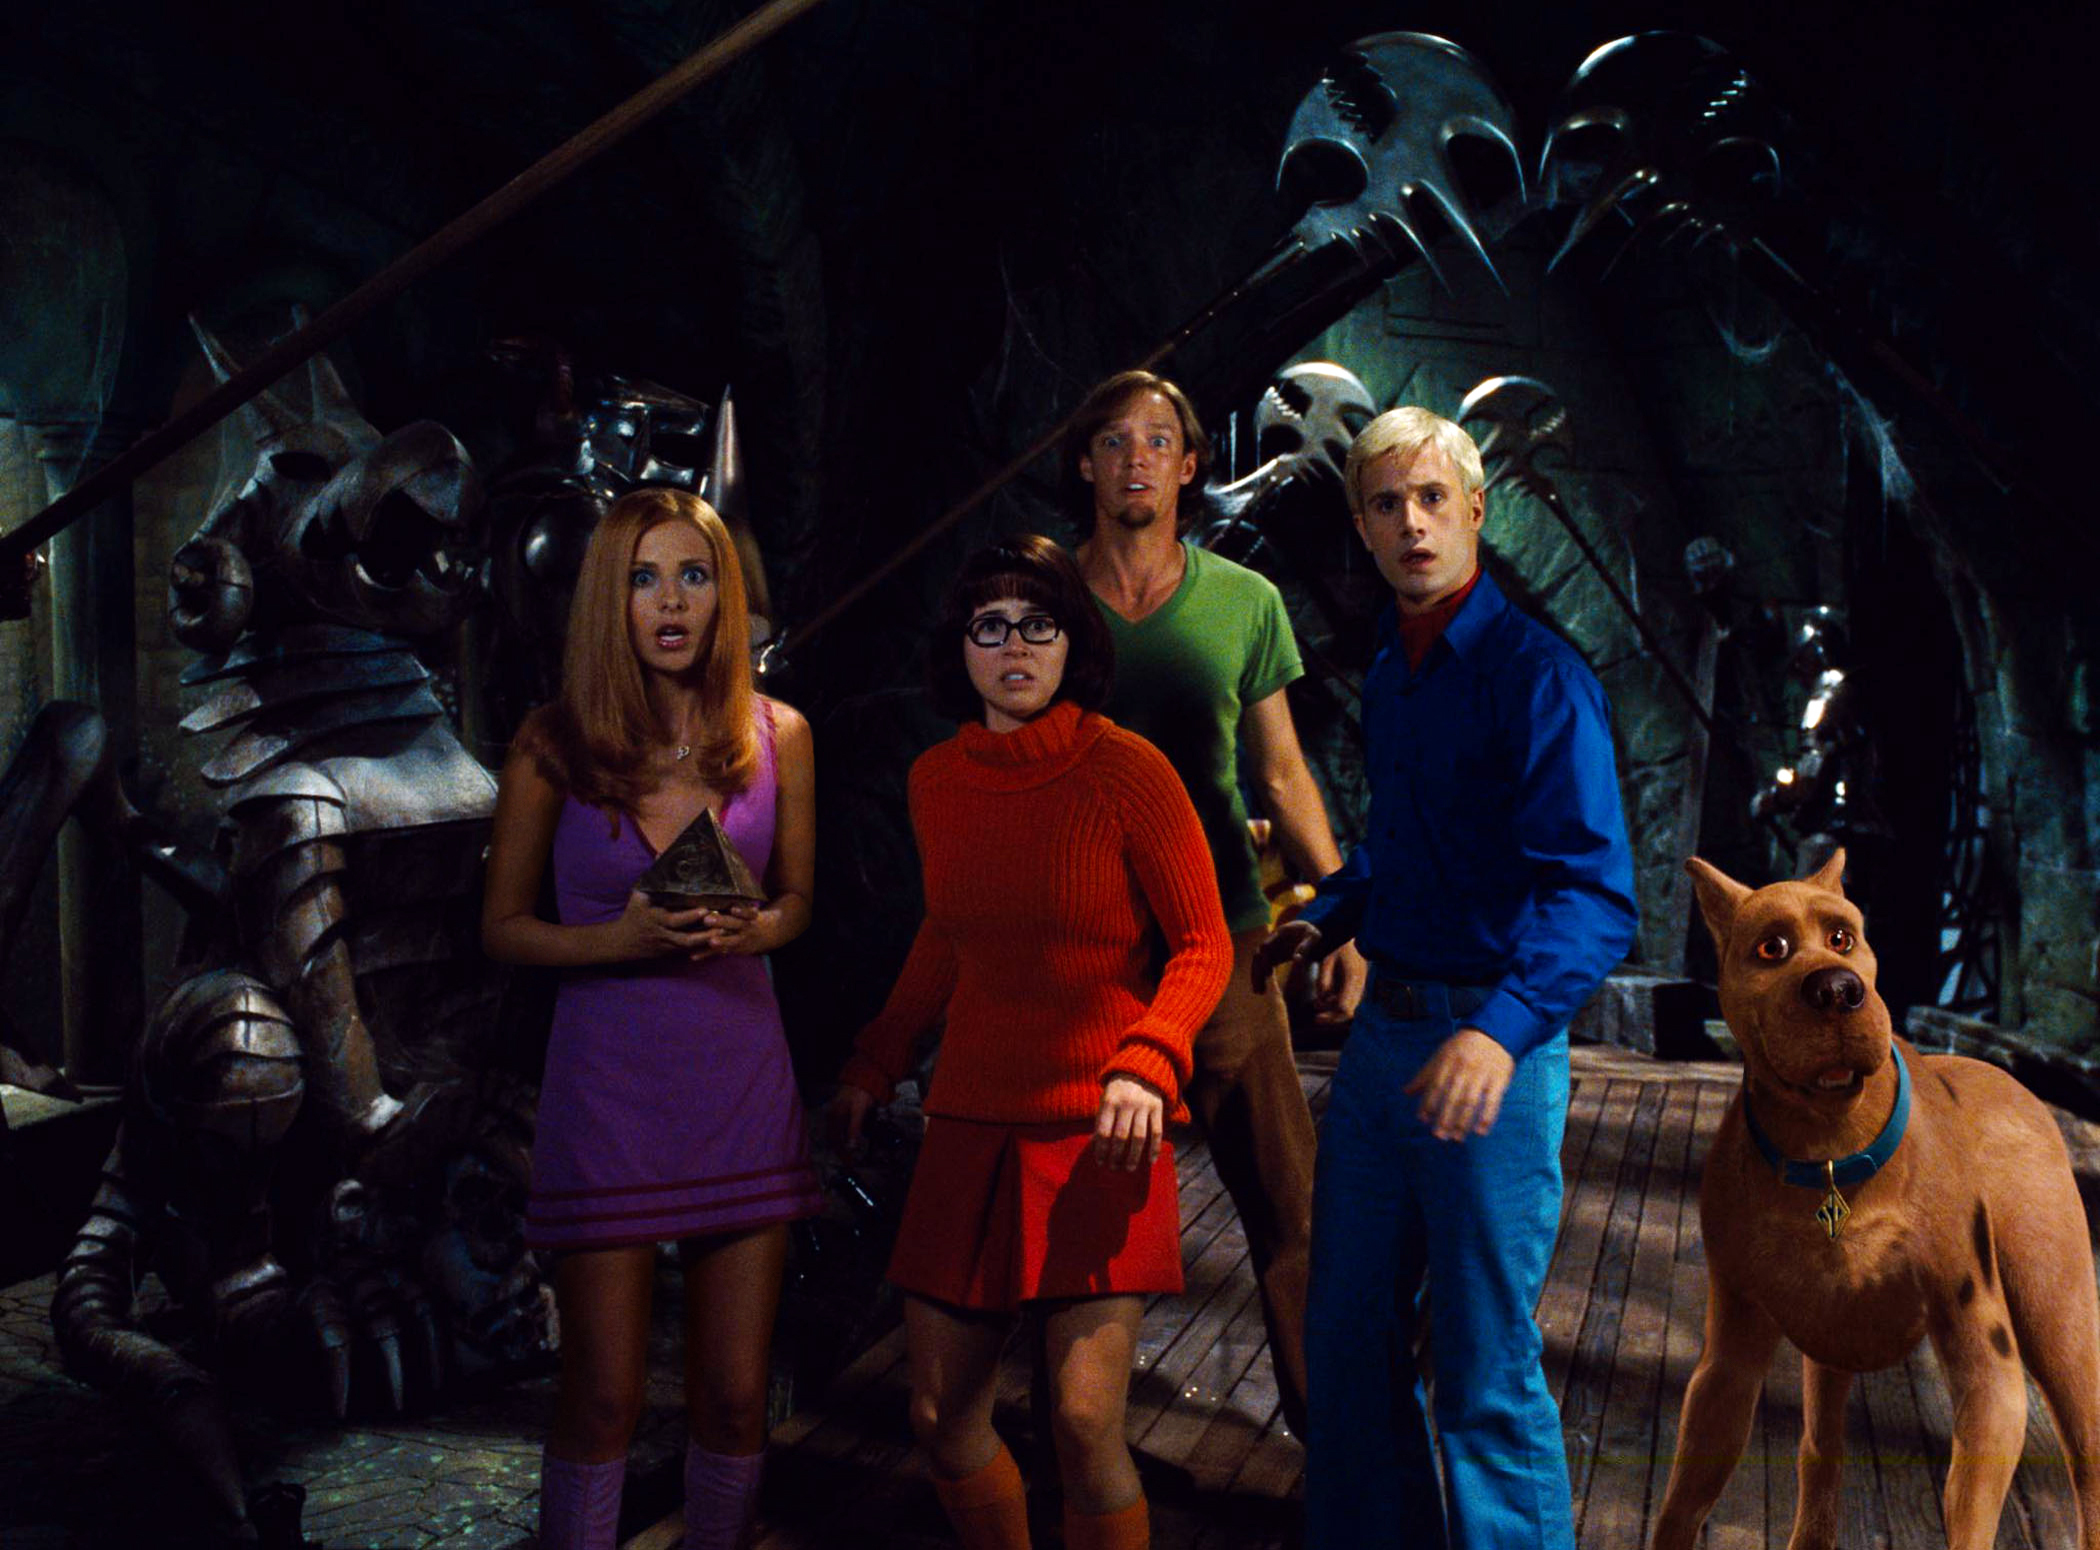 Movies Scooby Doo